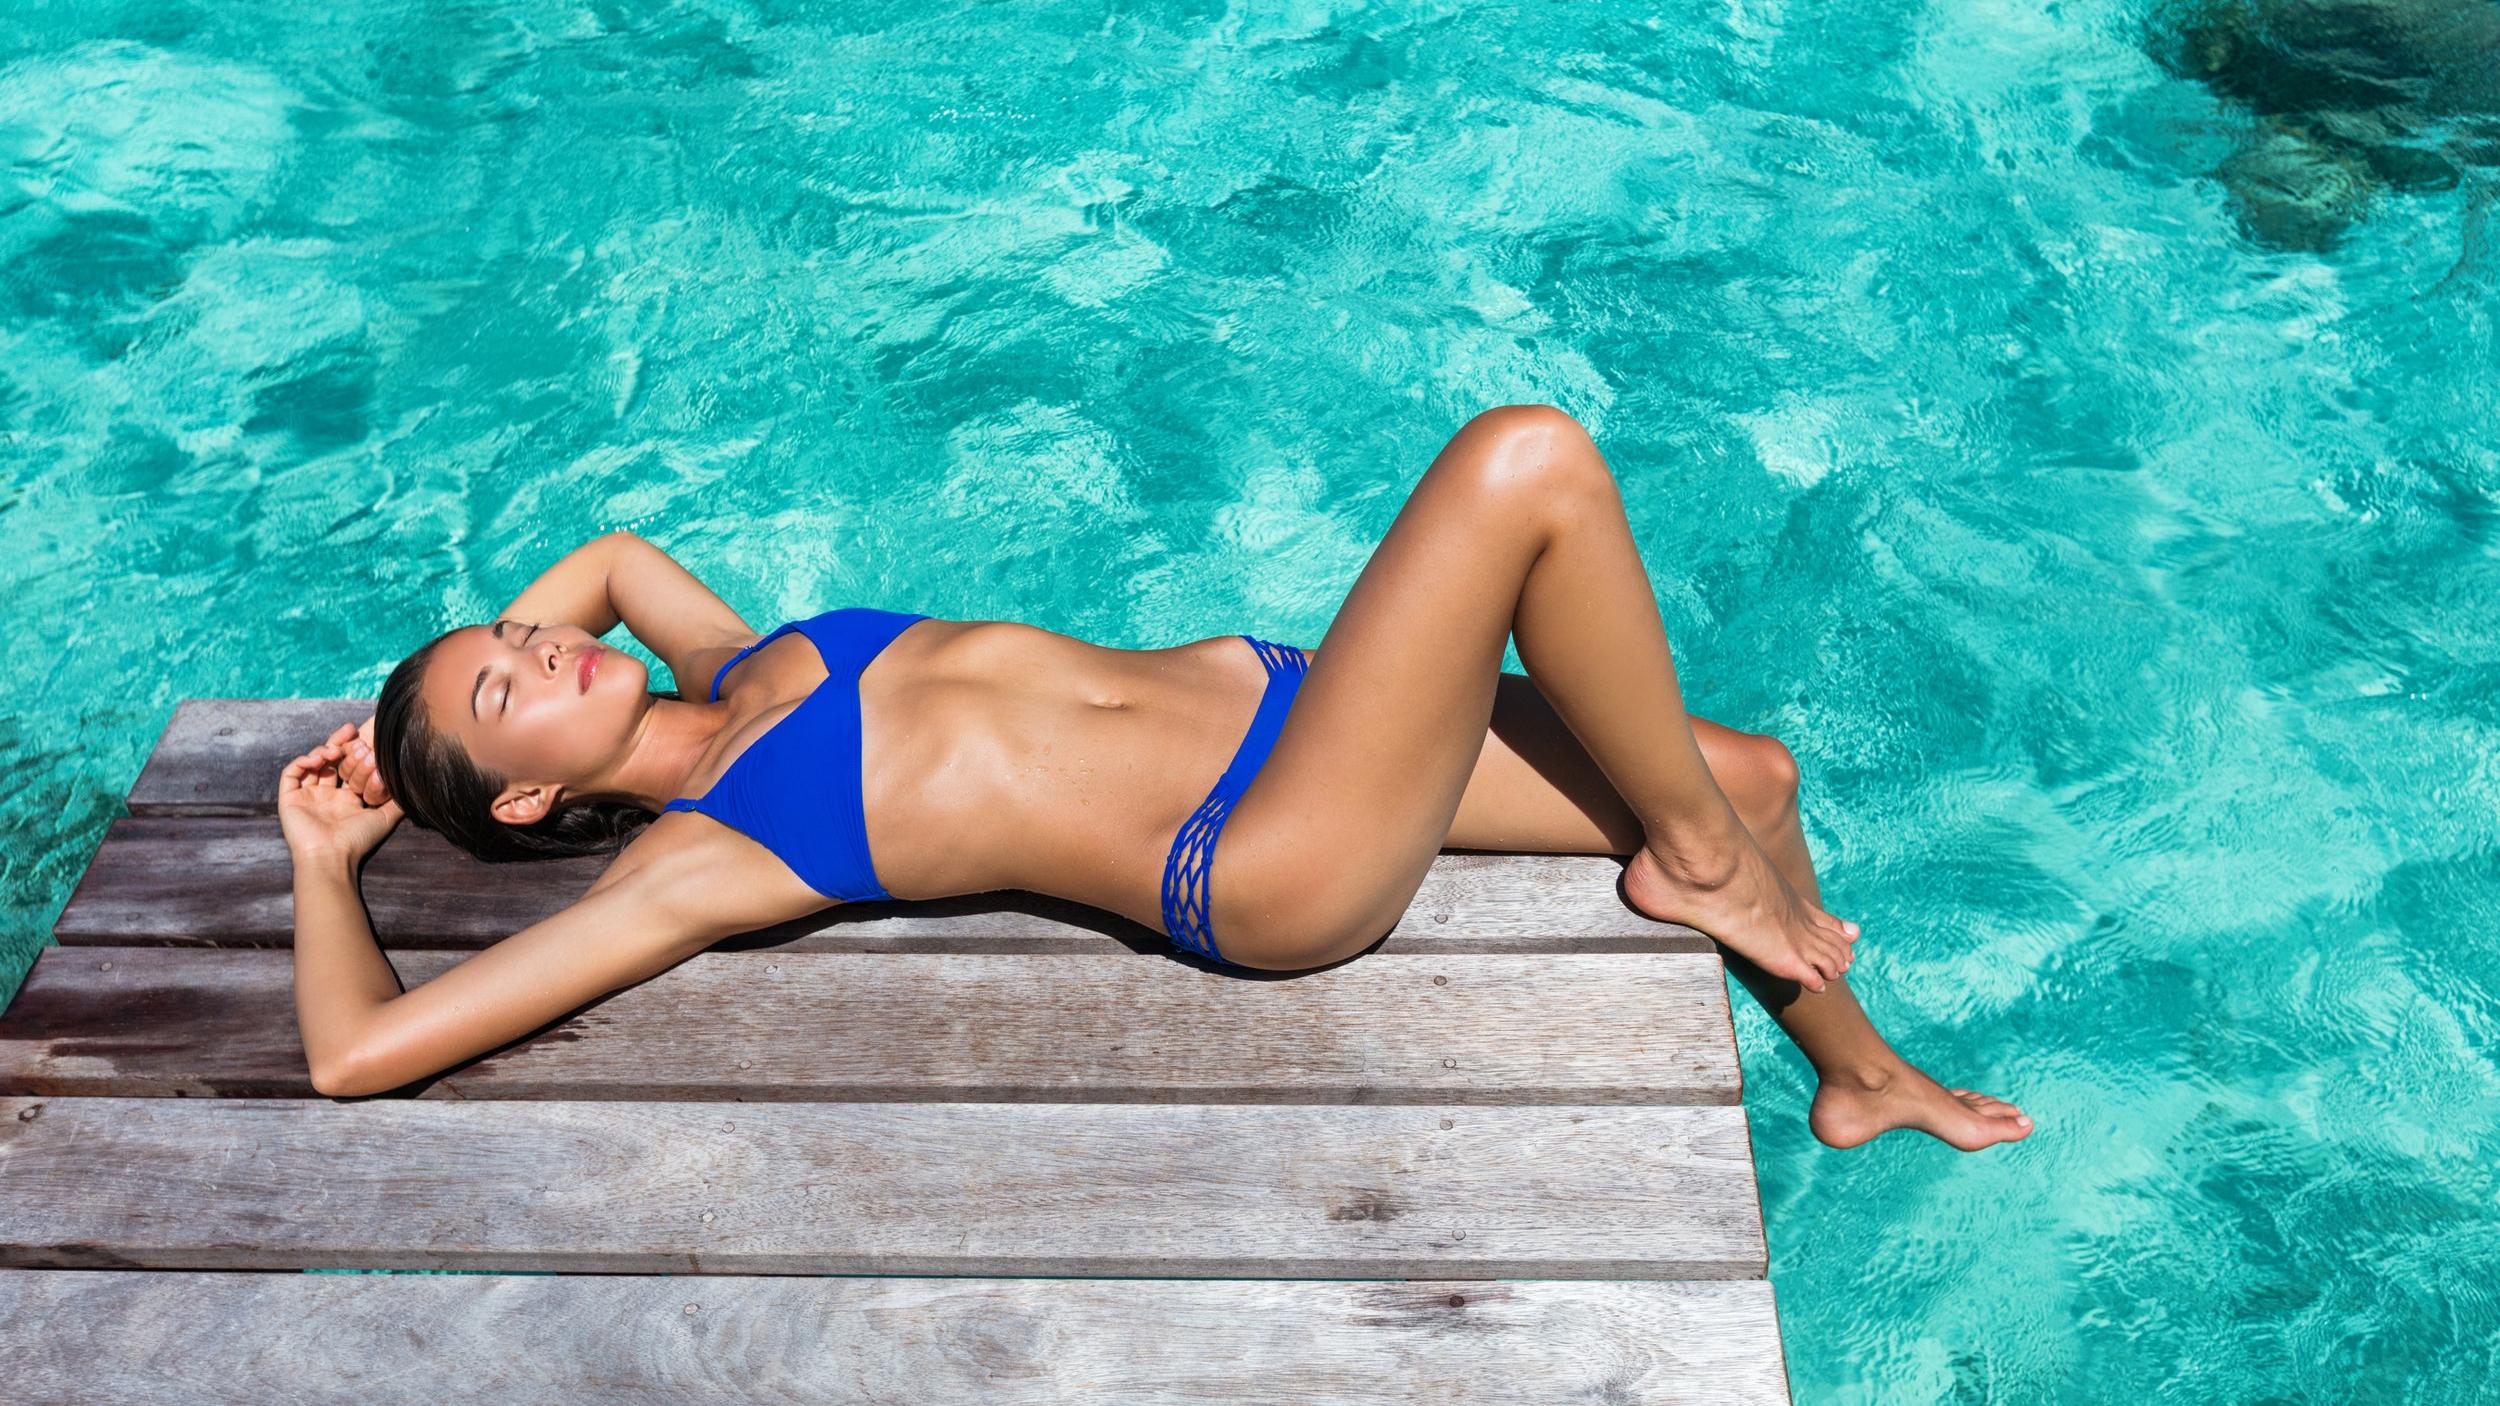 bikinigirlfullbody.jpg